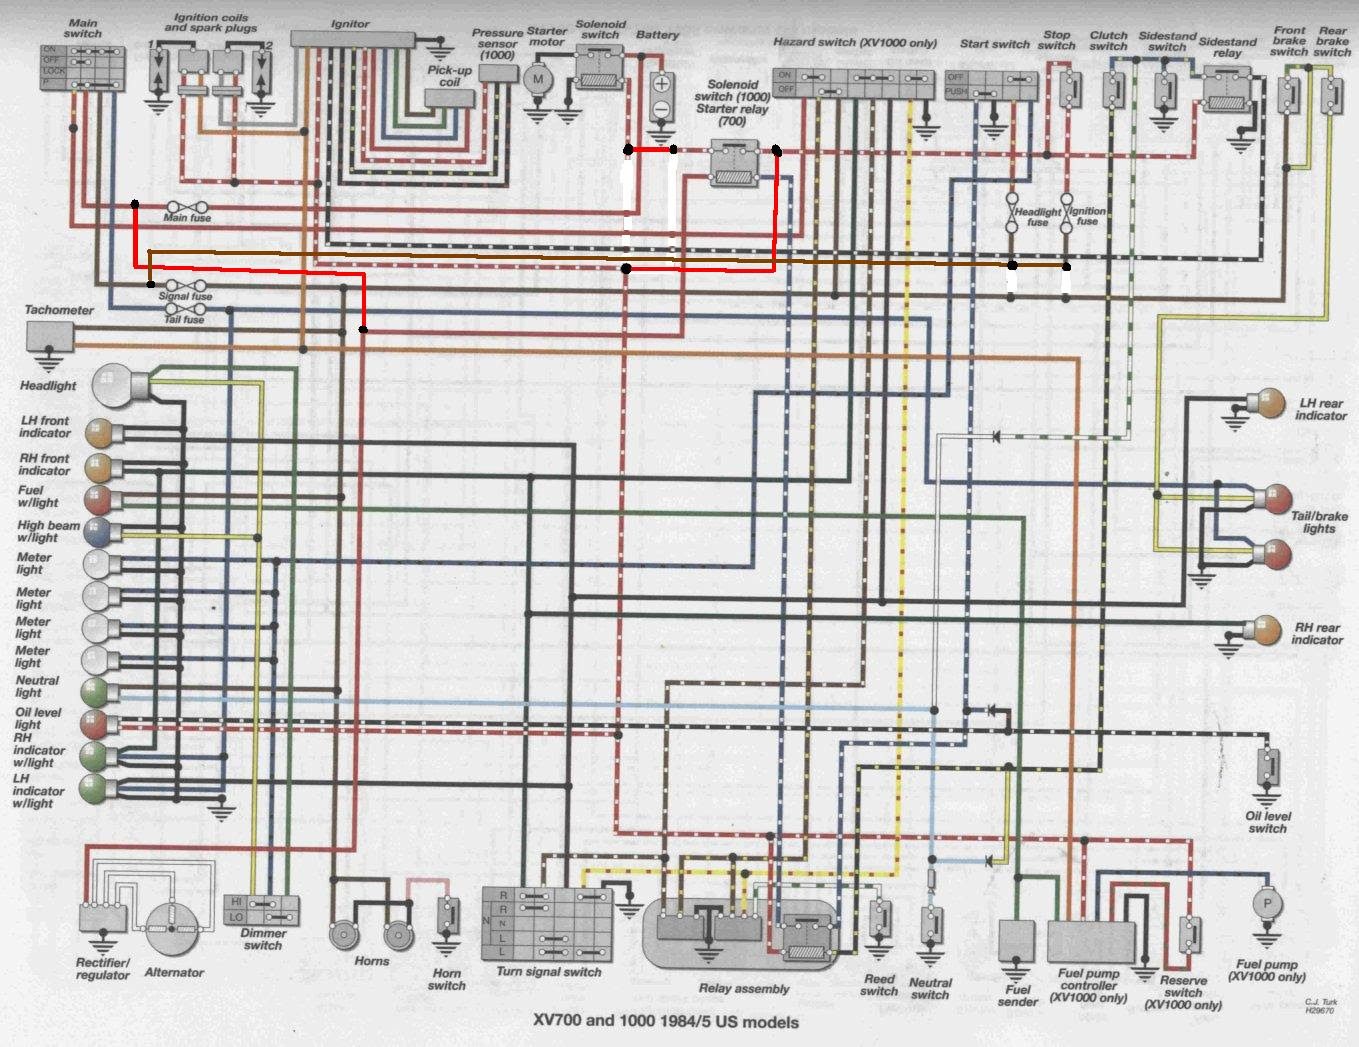 1986 yamaha virago 700 wiring diagram schematic  artedaprincesona.blogspot.com